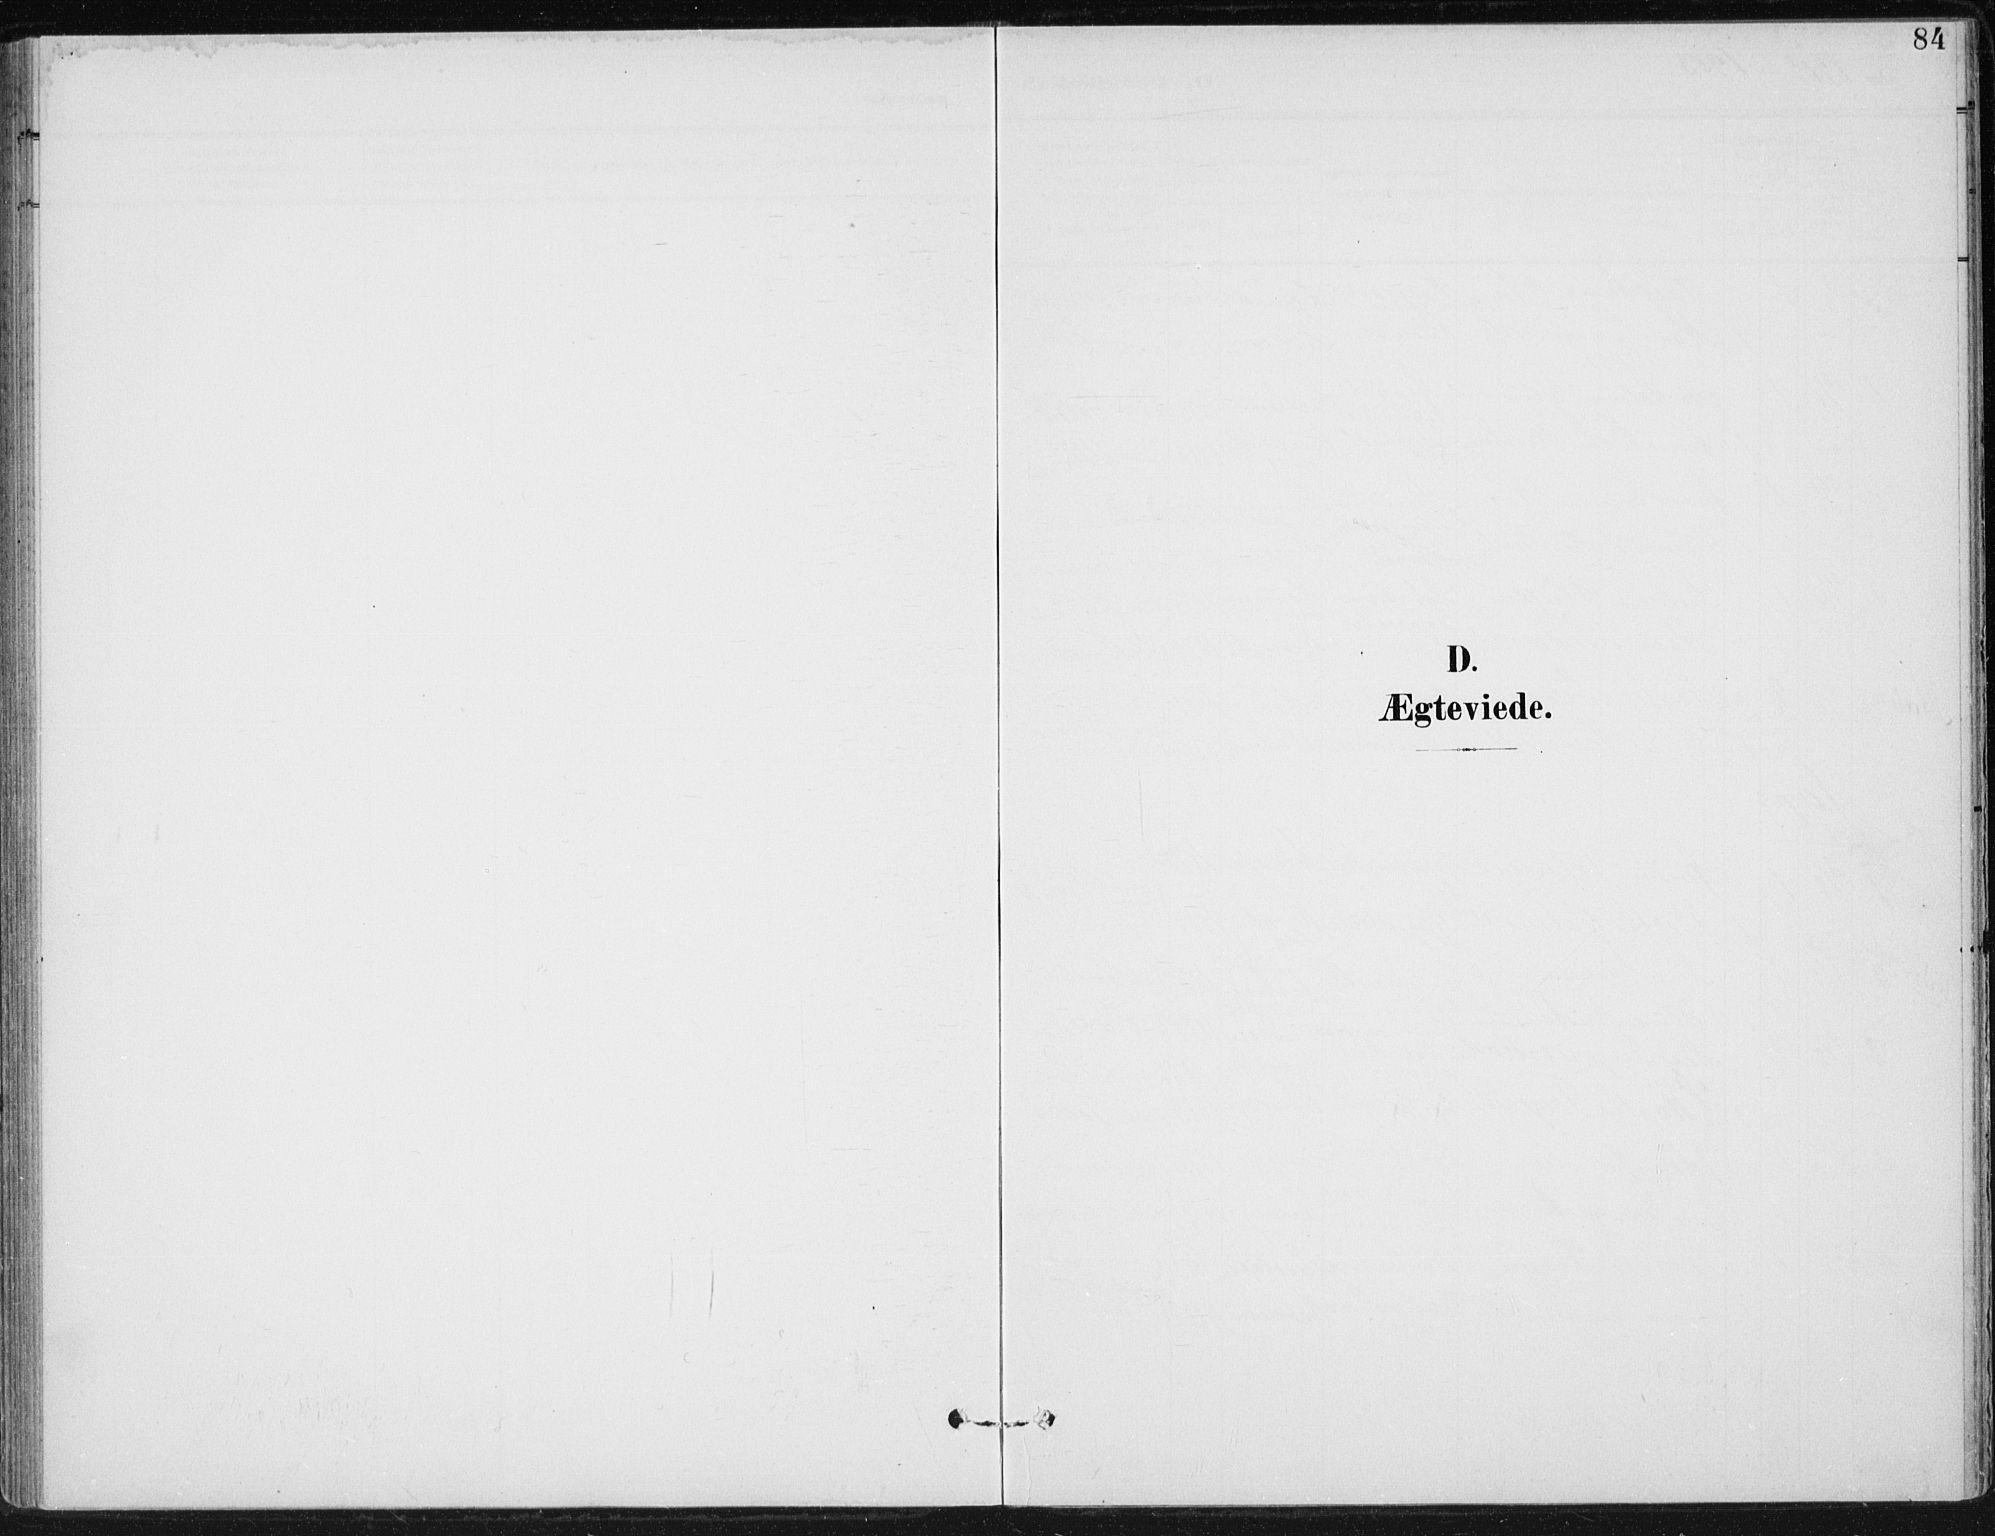 SAH, Østre Gausdal prestekontor, Ministerialbok nr. 5, 1902-1920, s. 84